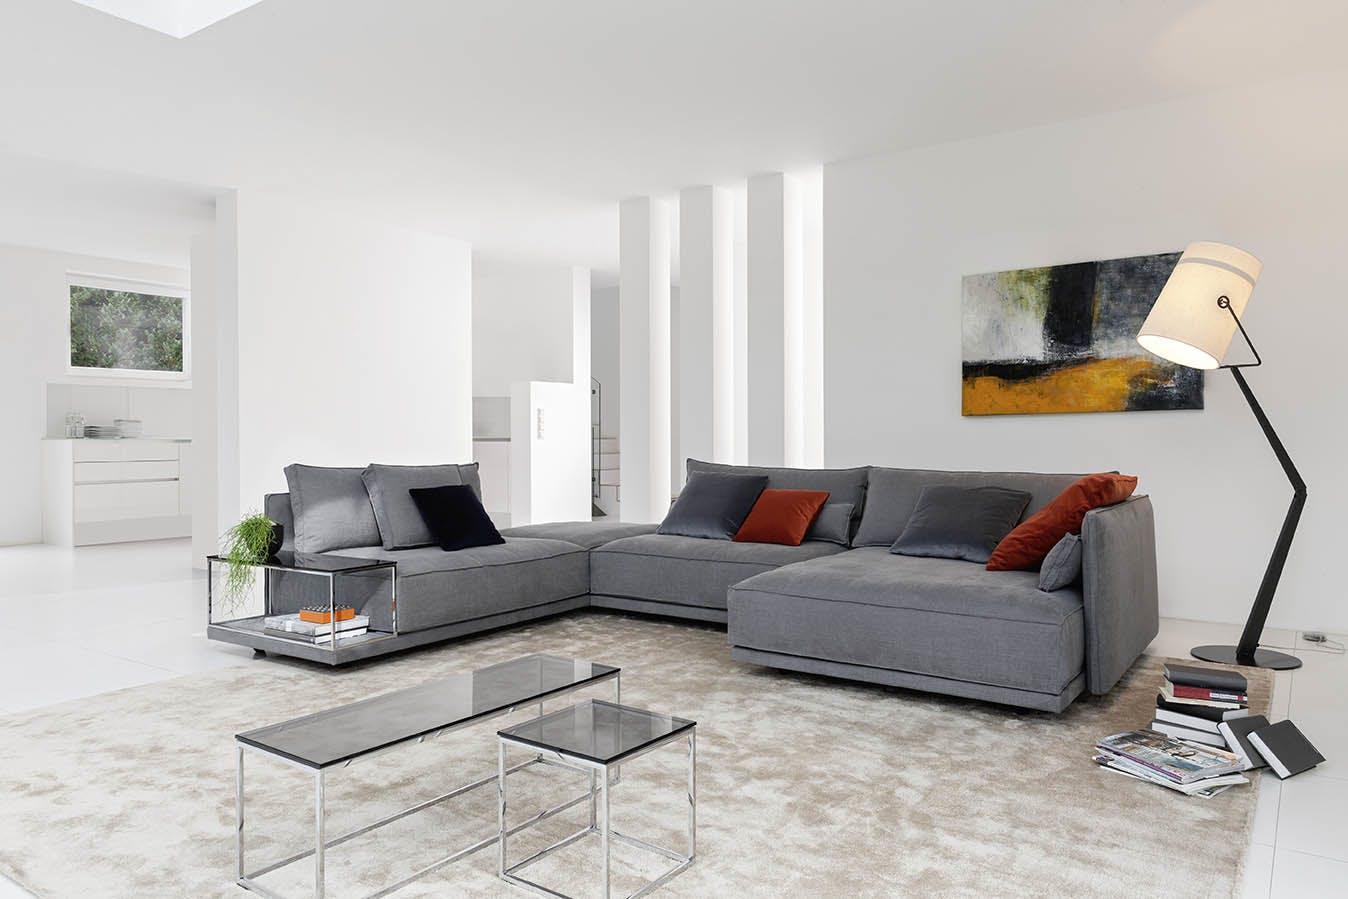 Jab Anstoetz Grey Cube Lounge Modular Sofa Insitu Haute Living